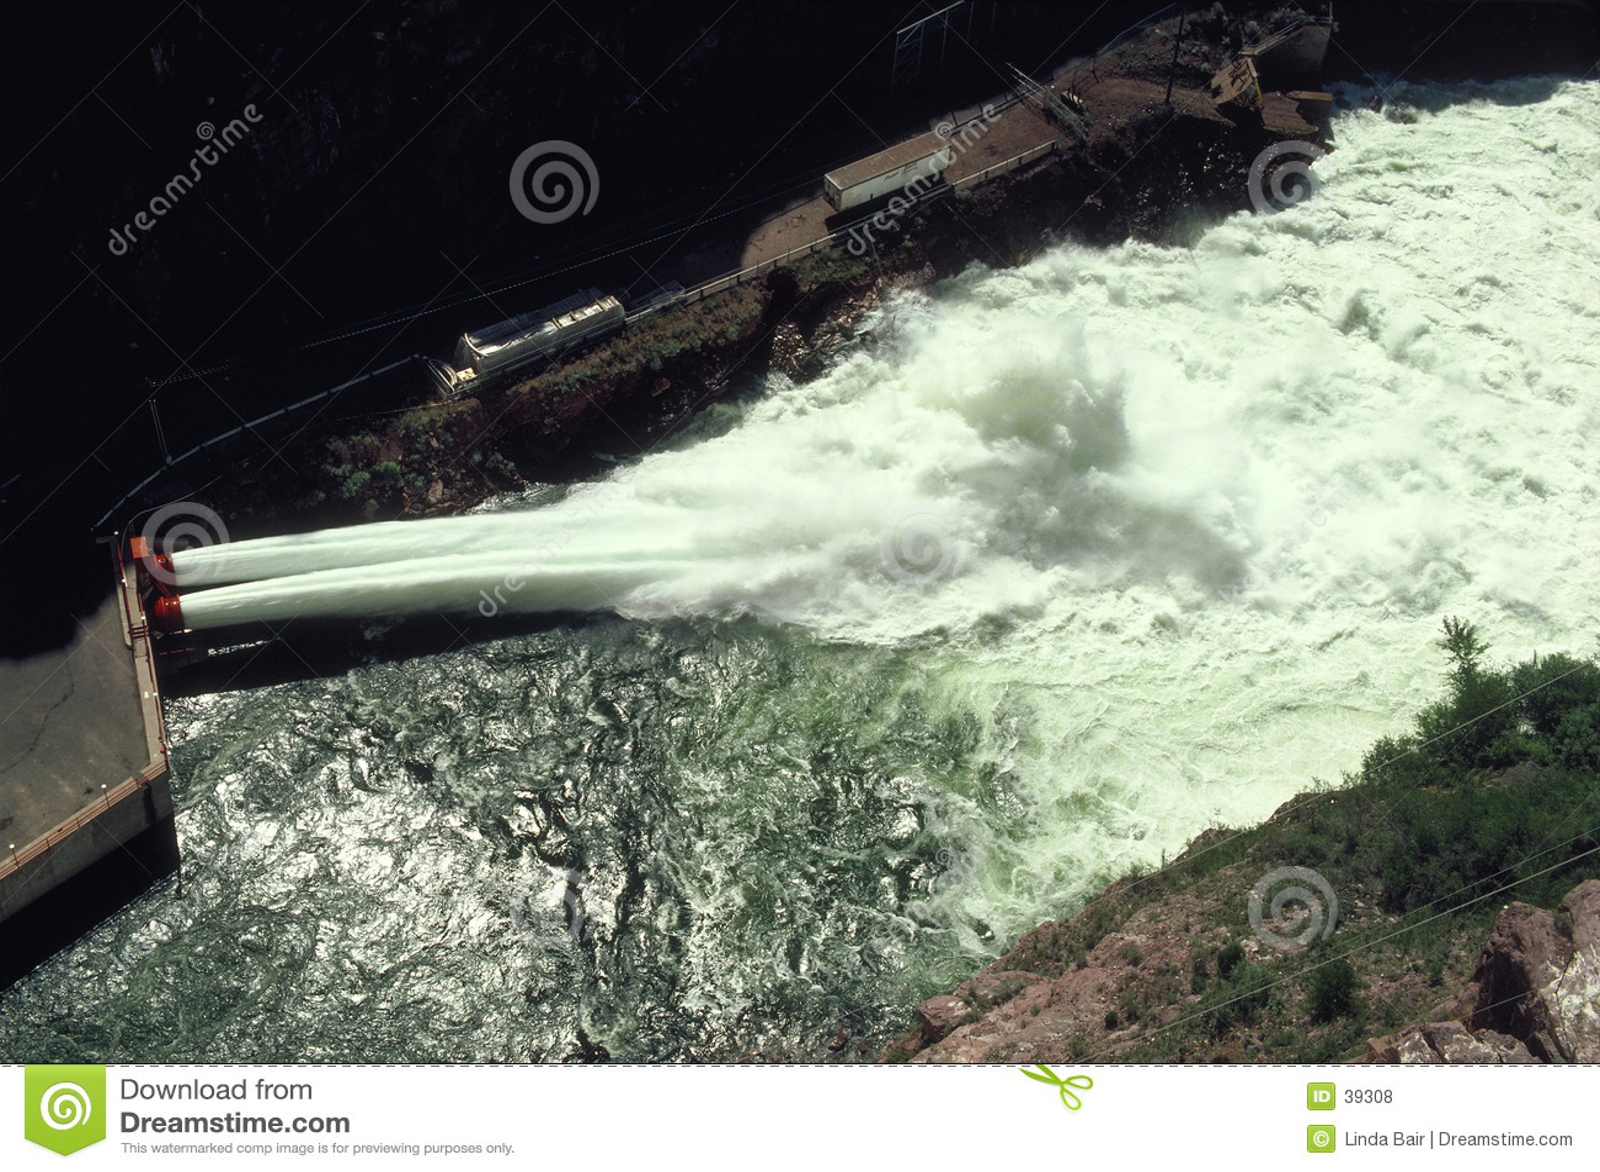 Hydro-electric Dam Spillway